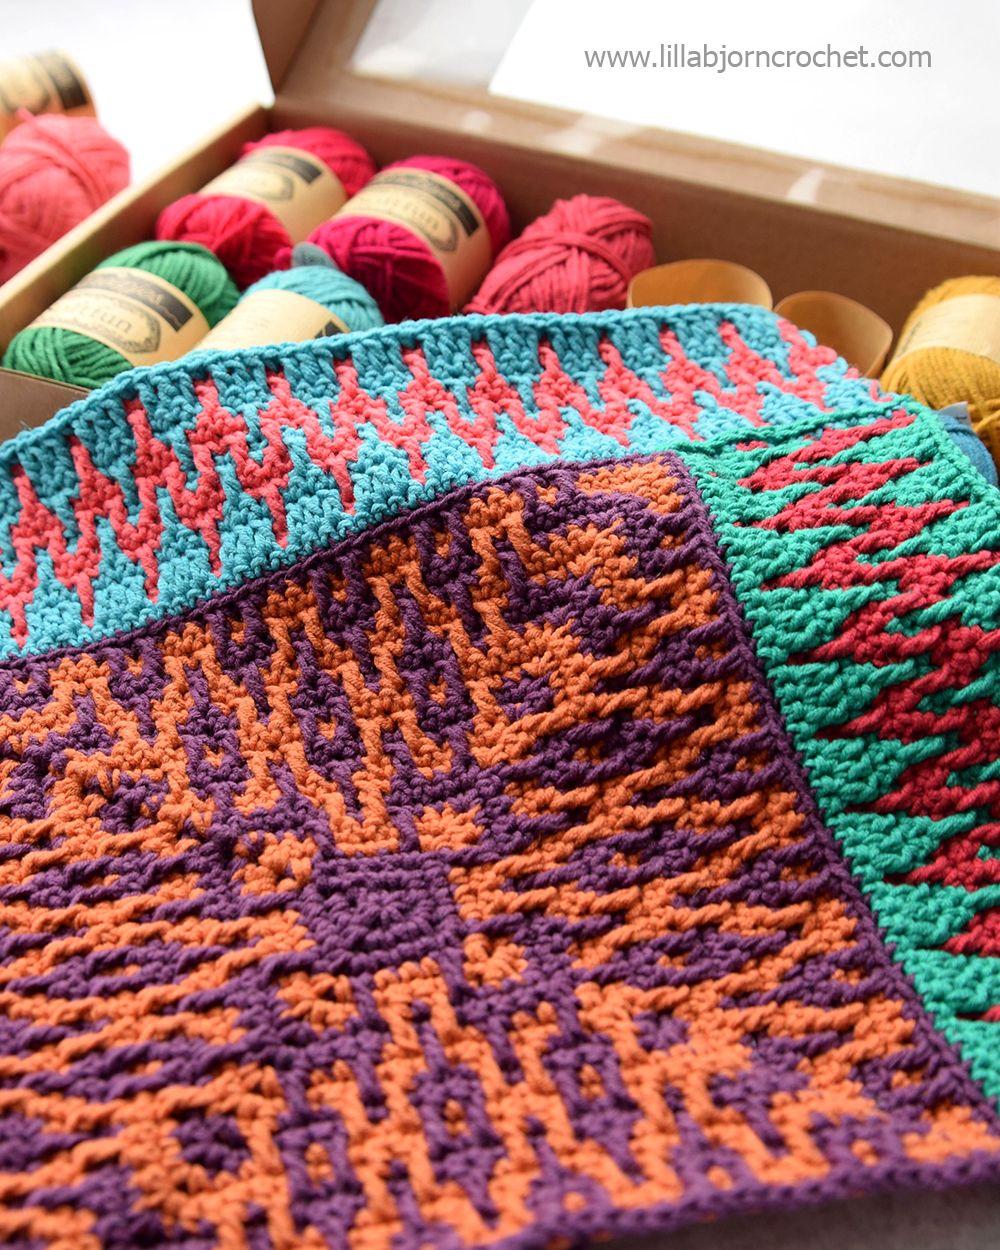 Mosaic crochet square